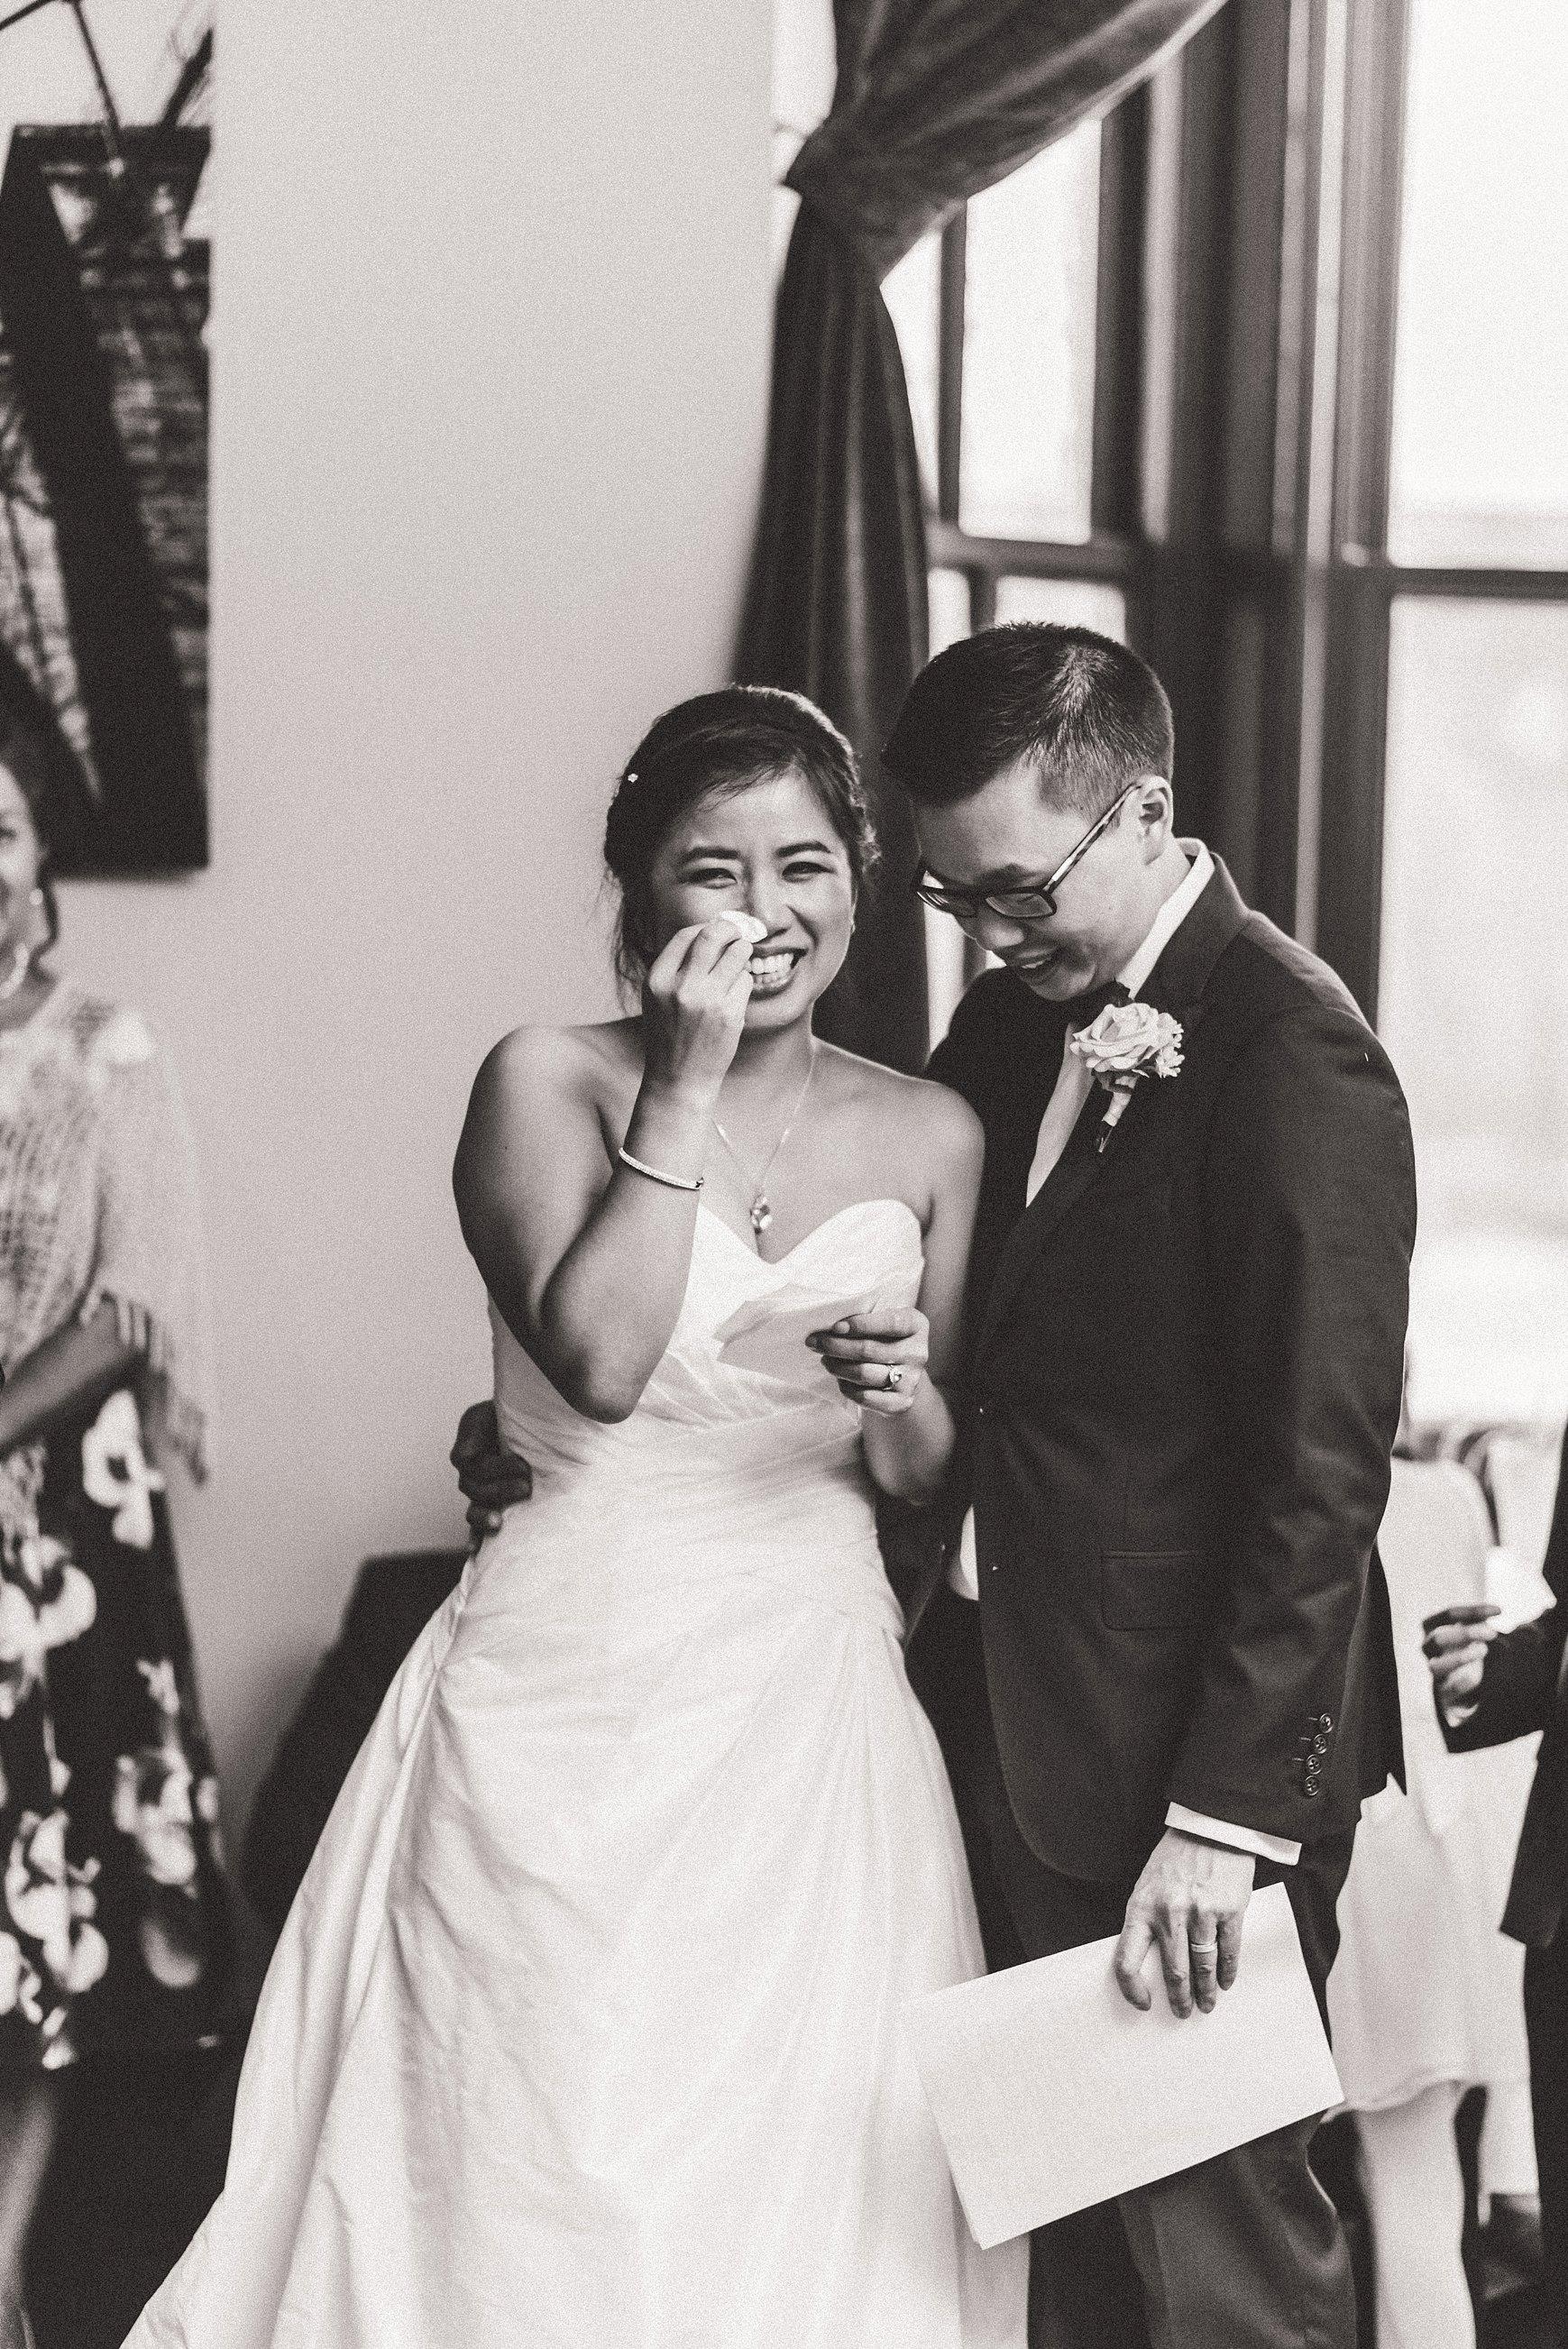 light airy indie fine art ottawa wedding photographer | Ali and Batoul Photography_1513.jpg